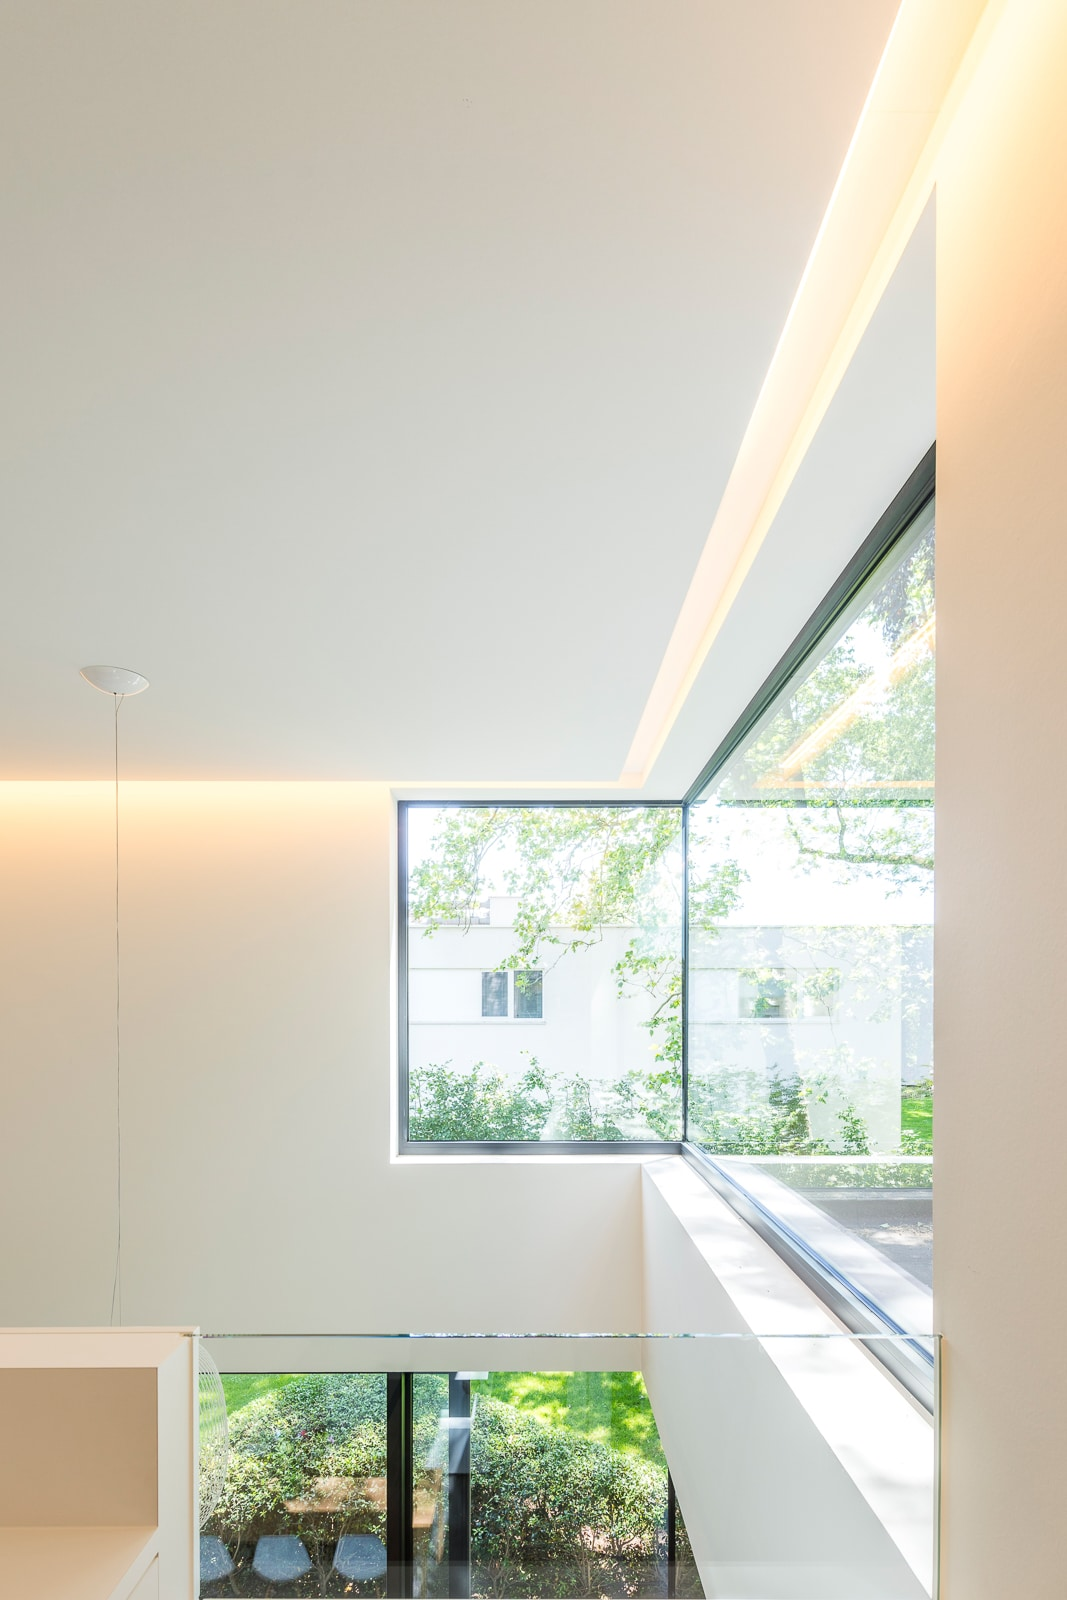 BaeyensBeck Kjell 054web | Baeyens & Beck architecten Gent | architect nieuwbouw renovatie interieur | high end | architectenbureau